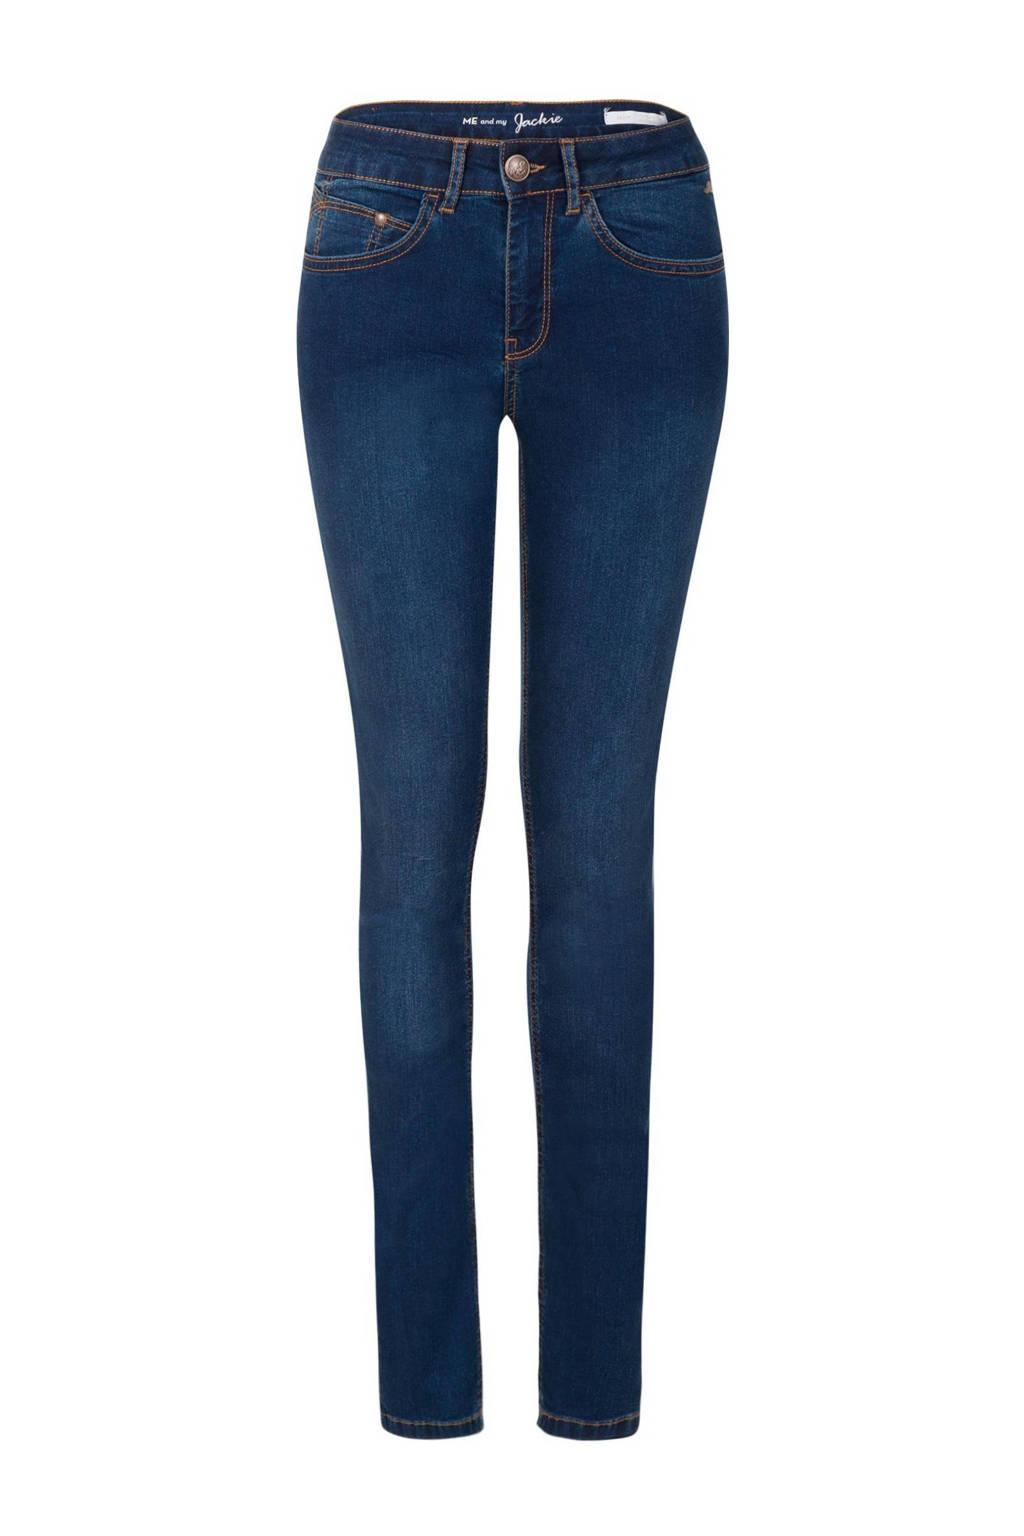 Miss Etam Regulier slim fit jeans Jackie 32 inch donkerblauw, Blauw